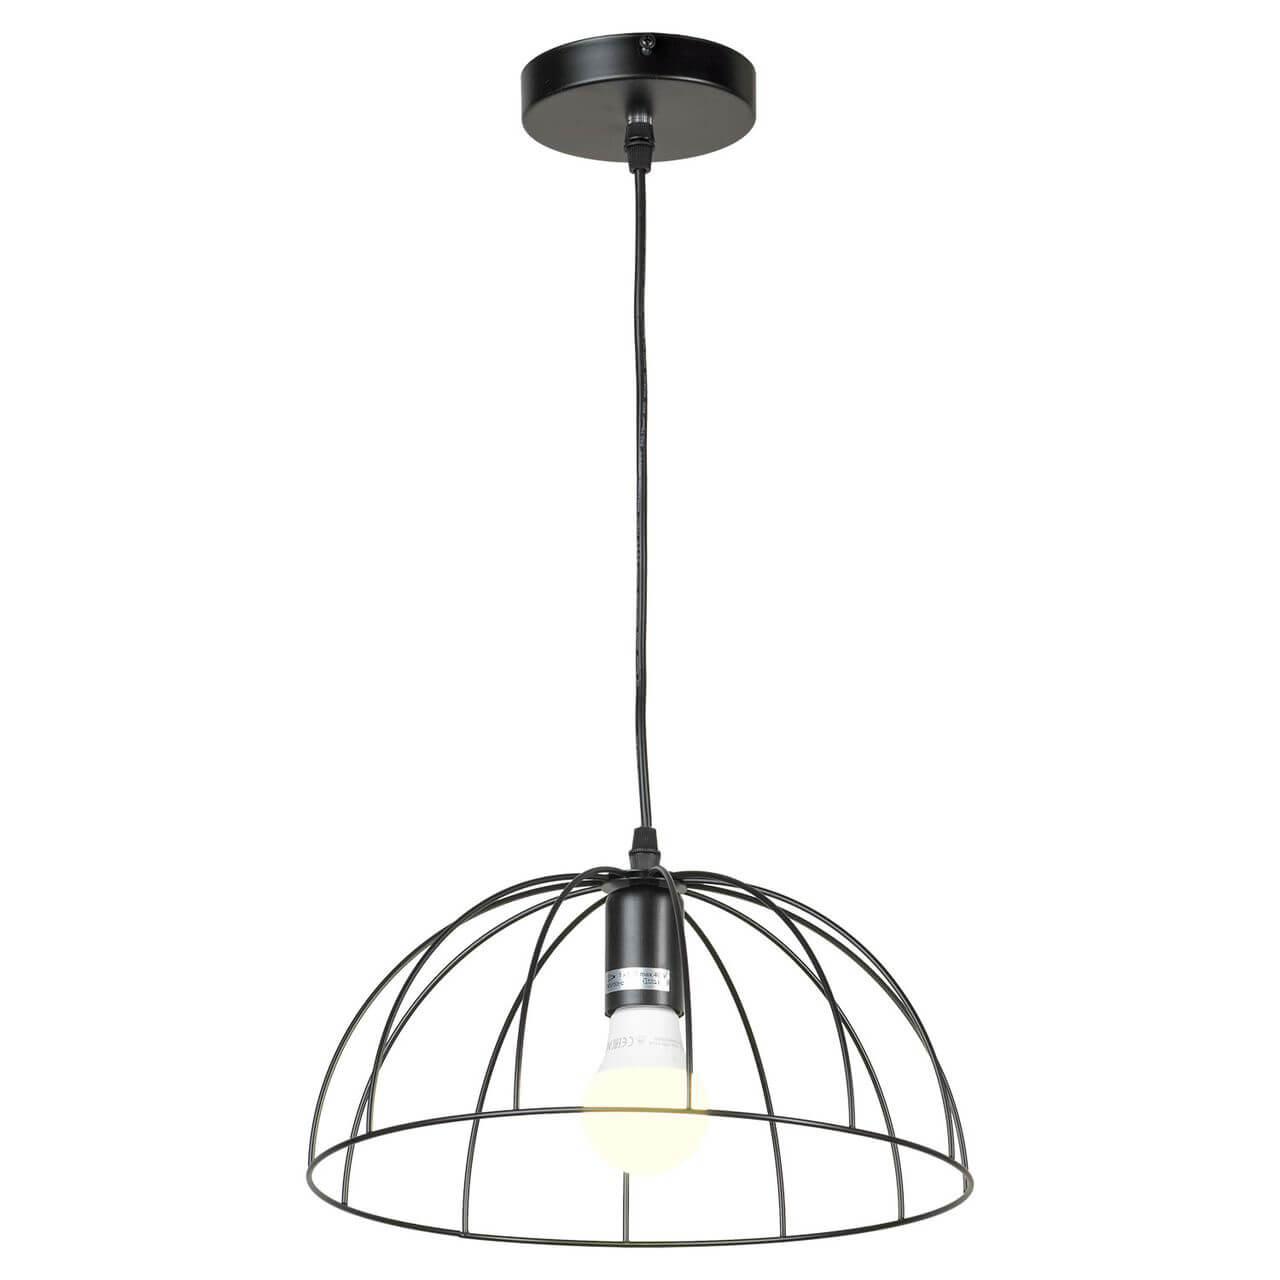 Светильник Lussole LSP-8213 Lattice